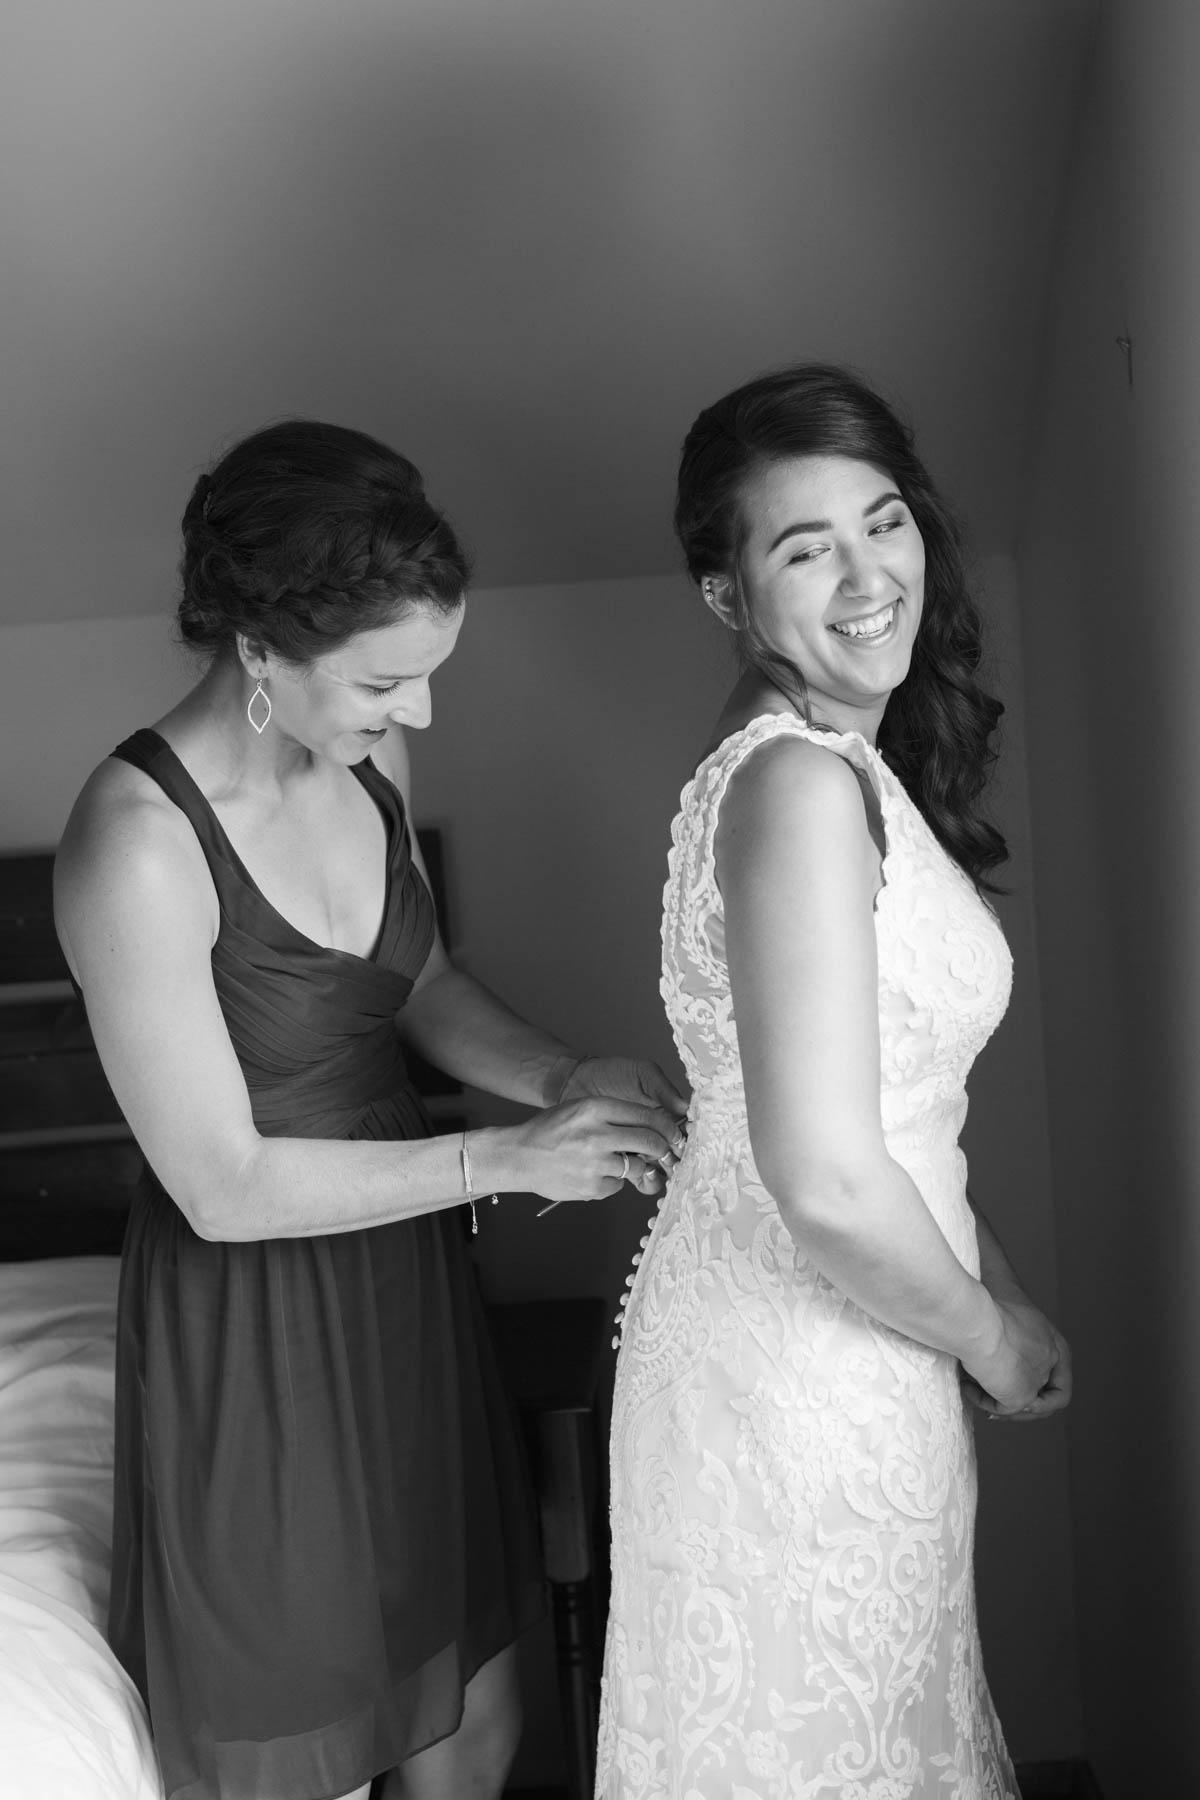 shotbychelsea_wedding_blog-6.jpg